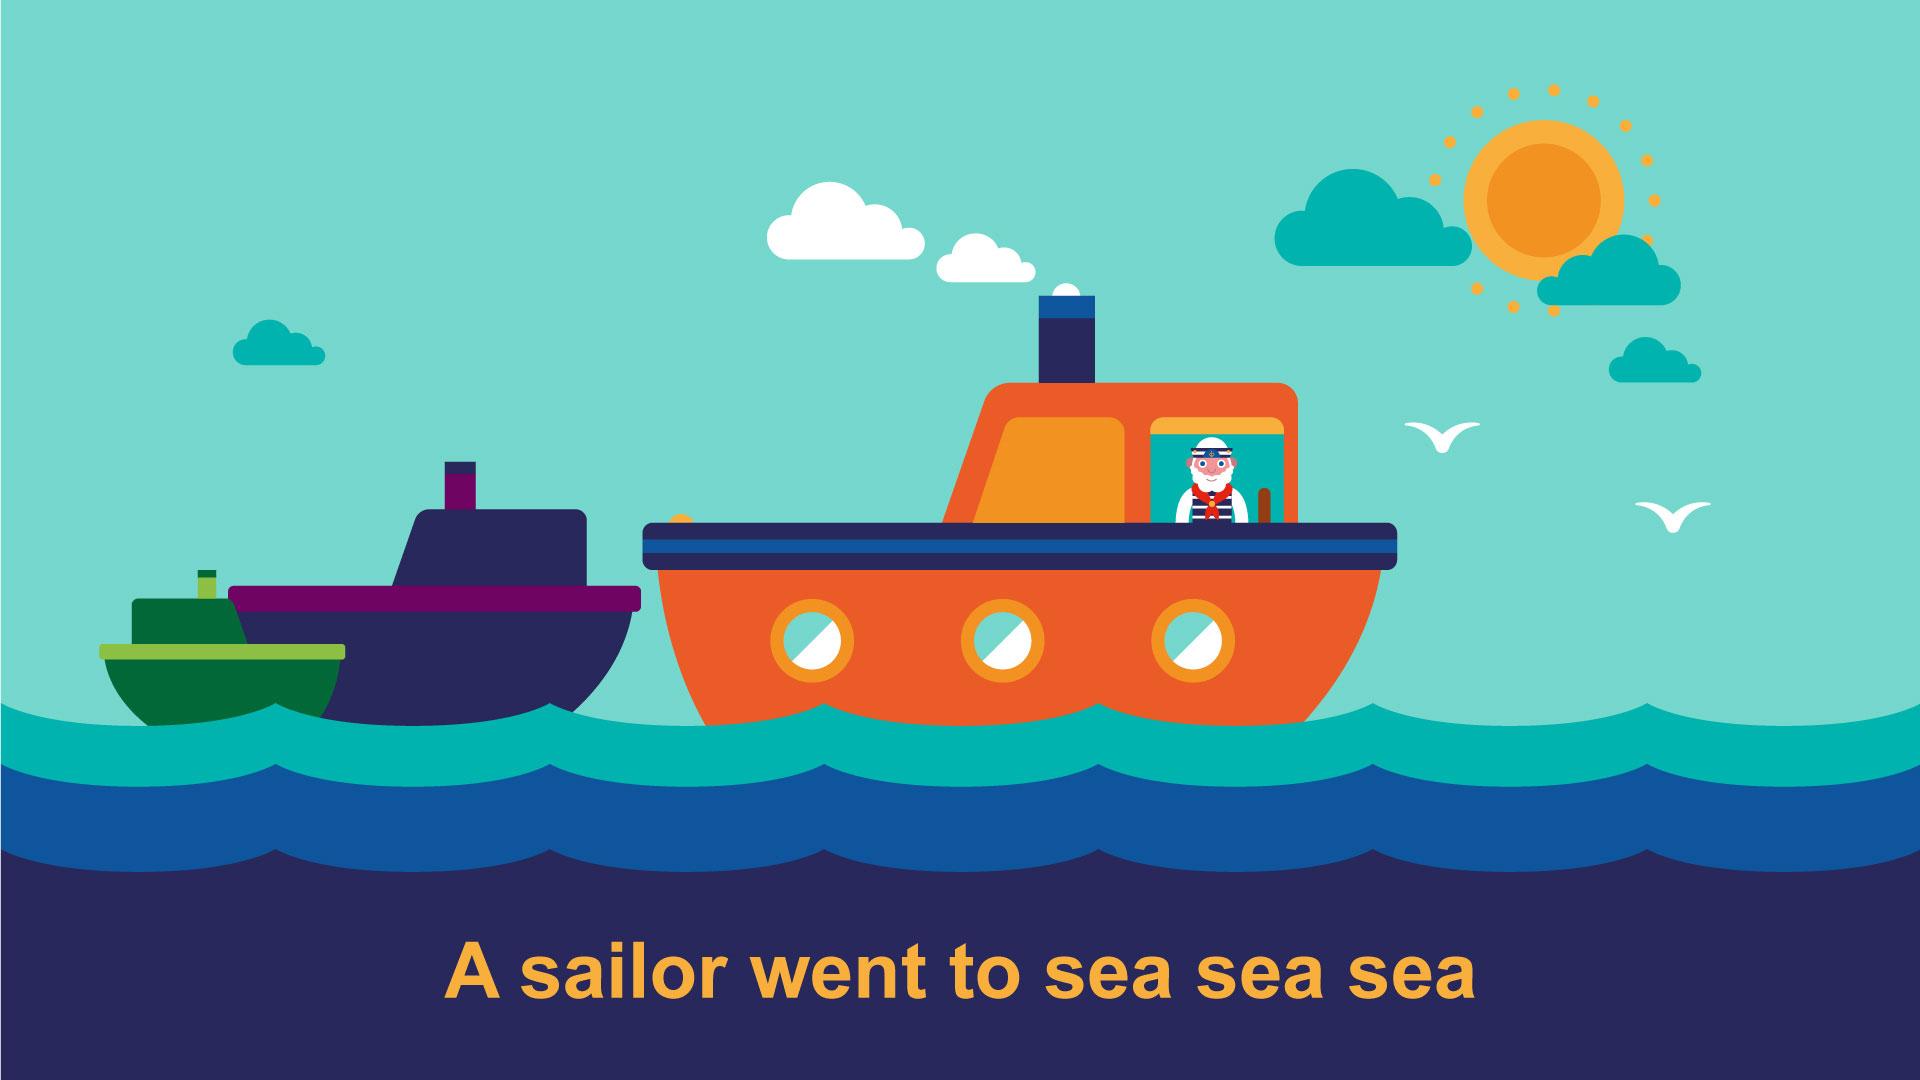 BBC School Radio: Nursery songs and rhymes - A sailor went to sea, sea, sea